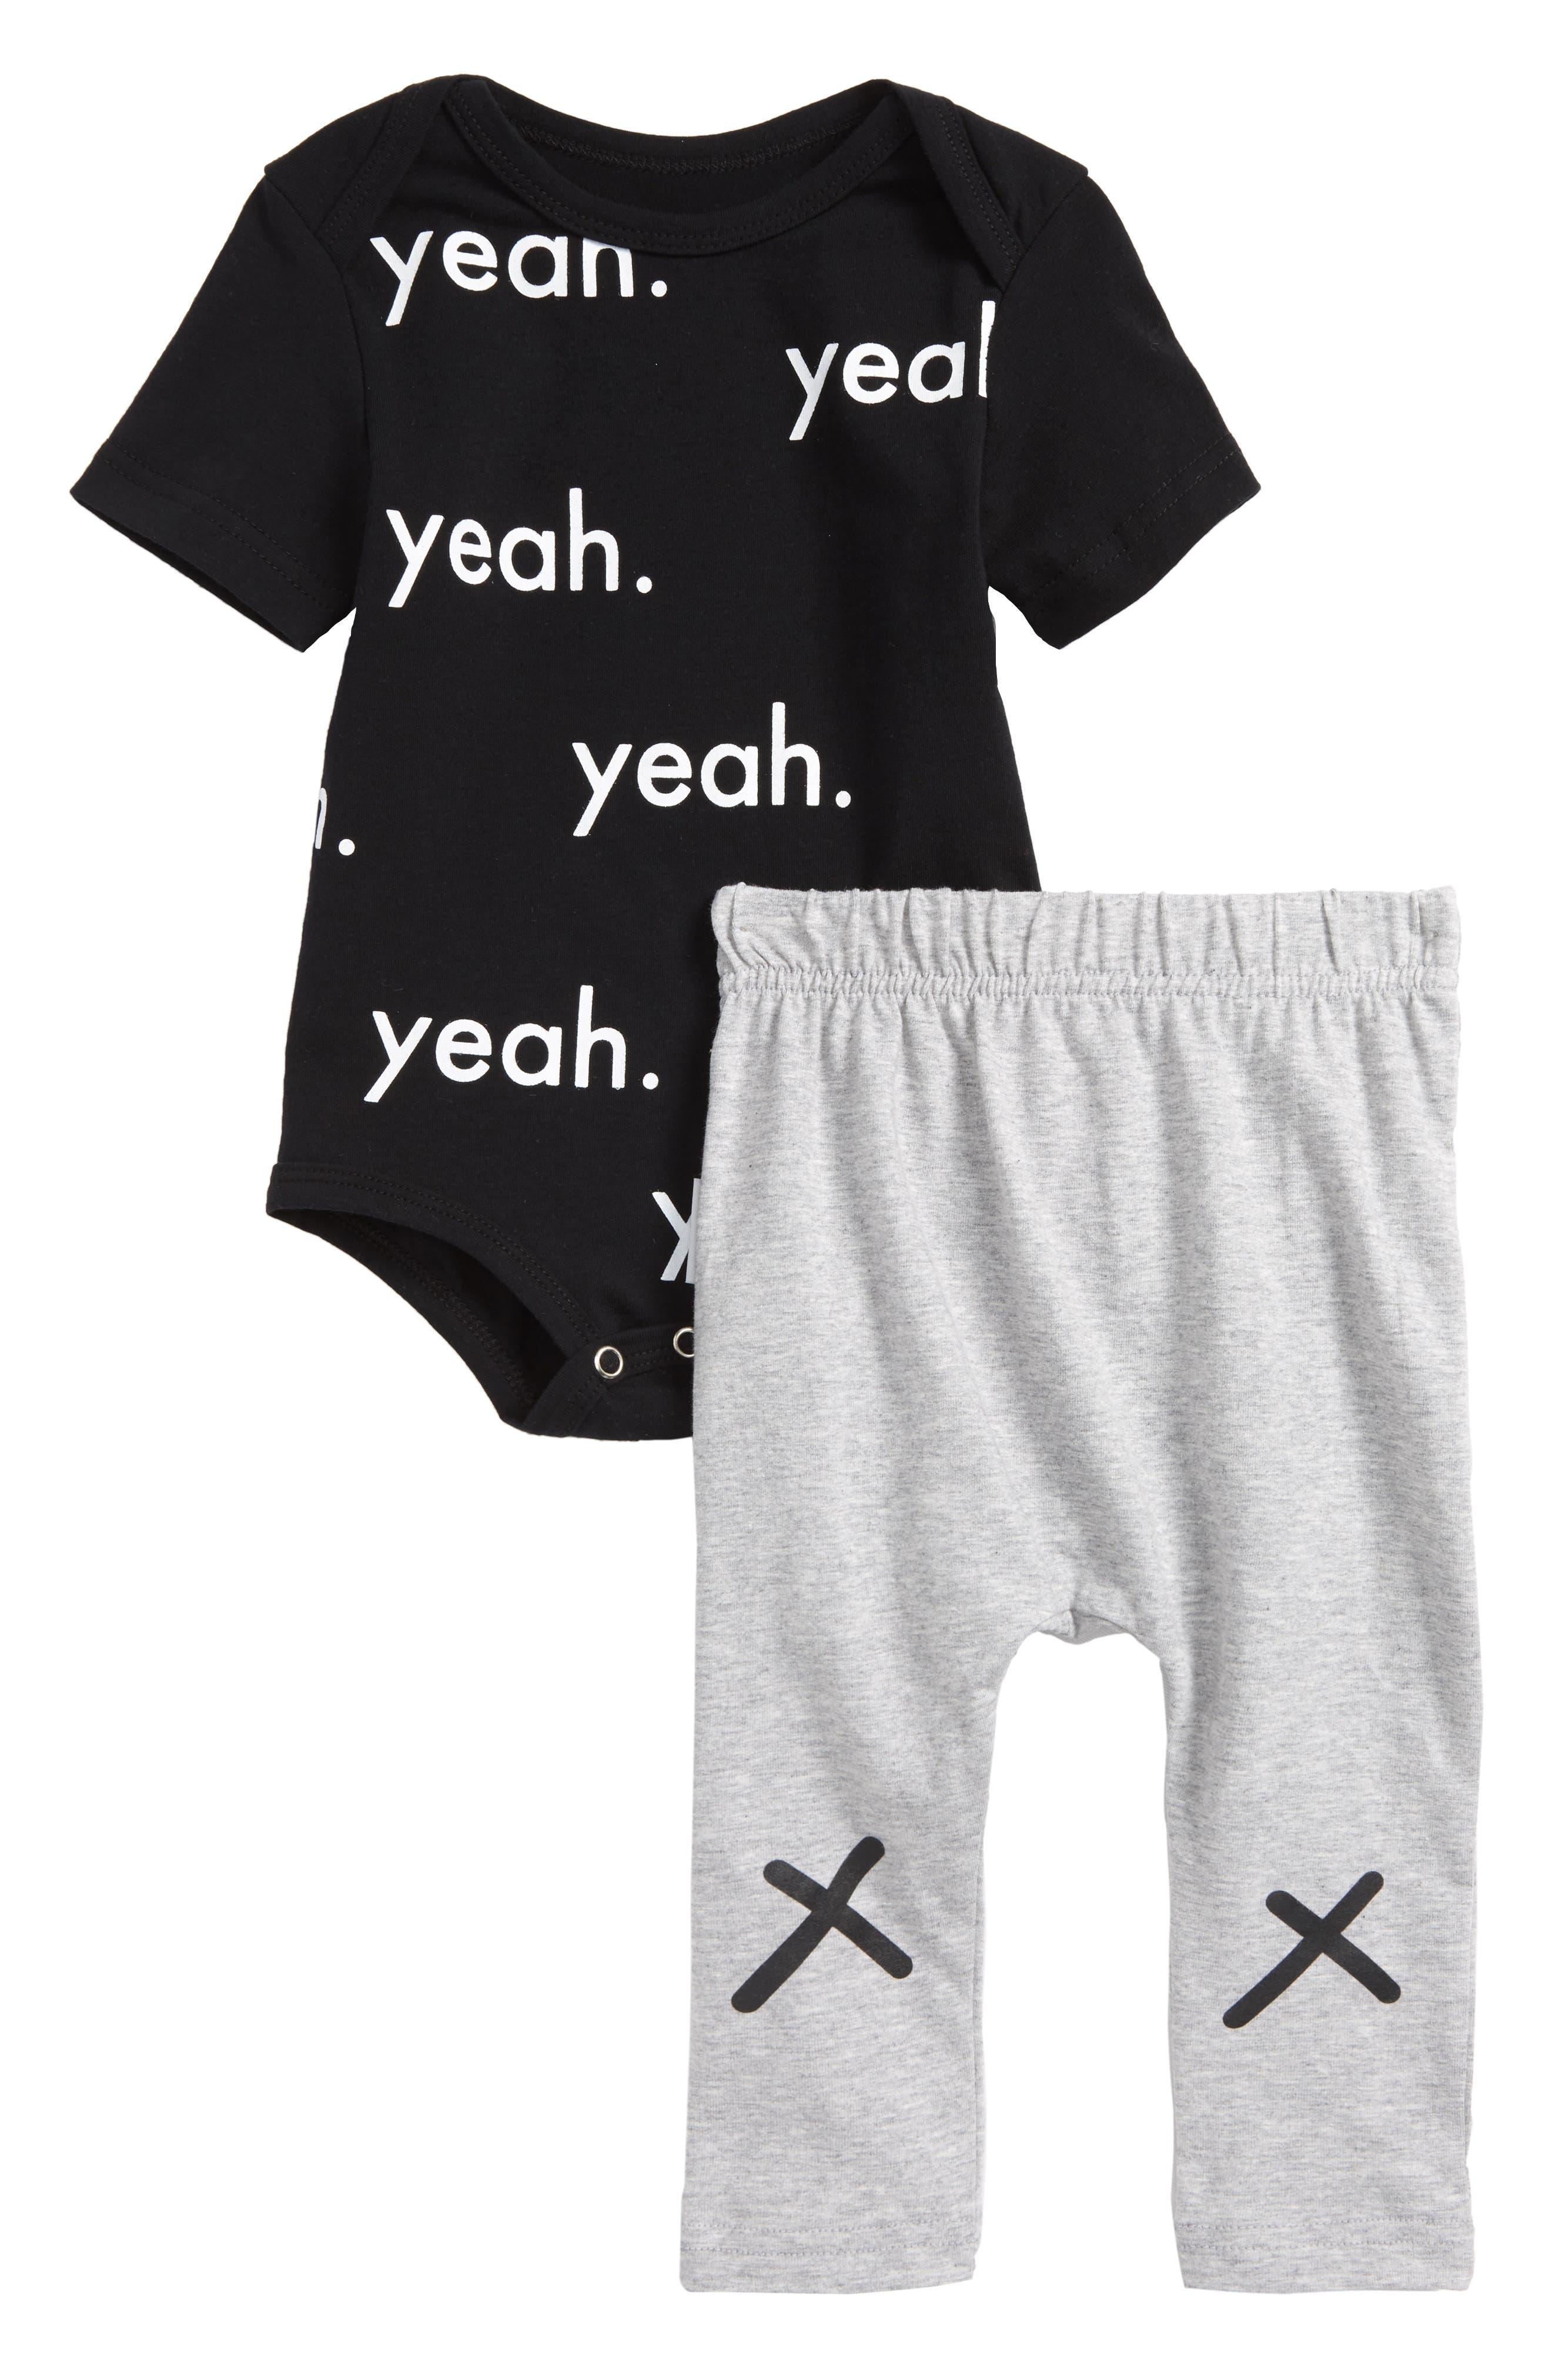 TINY TRIBE Yeah Bodysuit & Pants Set, Main, color, 001